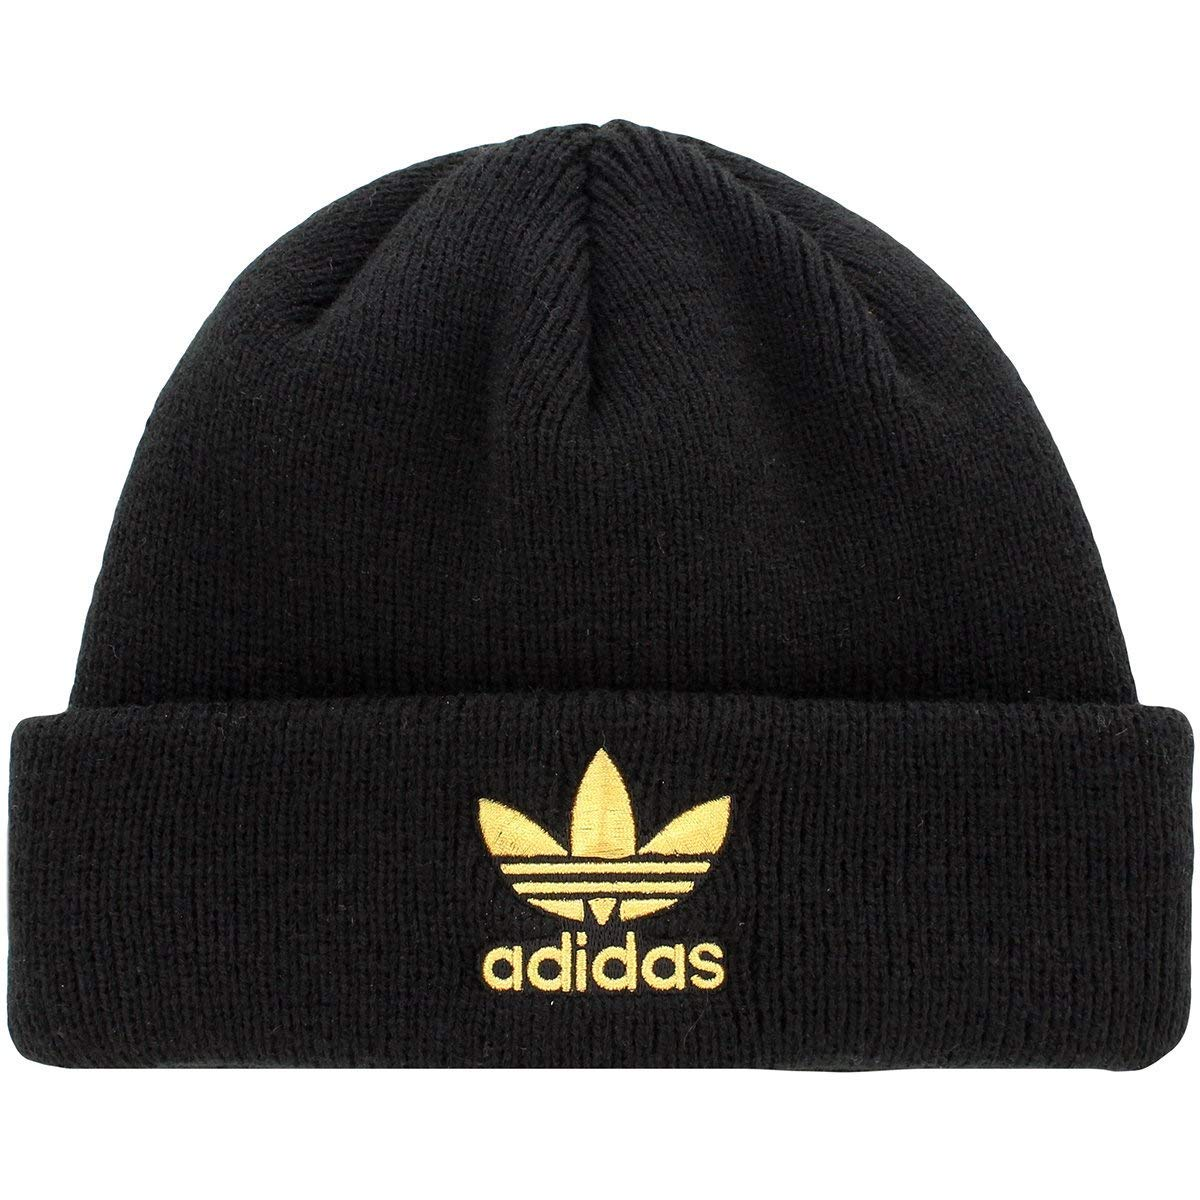 59e332343f8 Amazon.com  Adidas Womens Originals Trefoil Ii Knit Beanie Black Gold …   Clothing